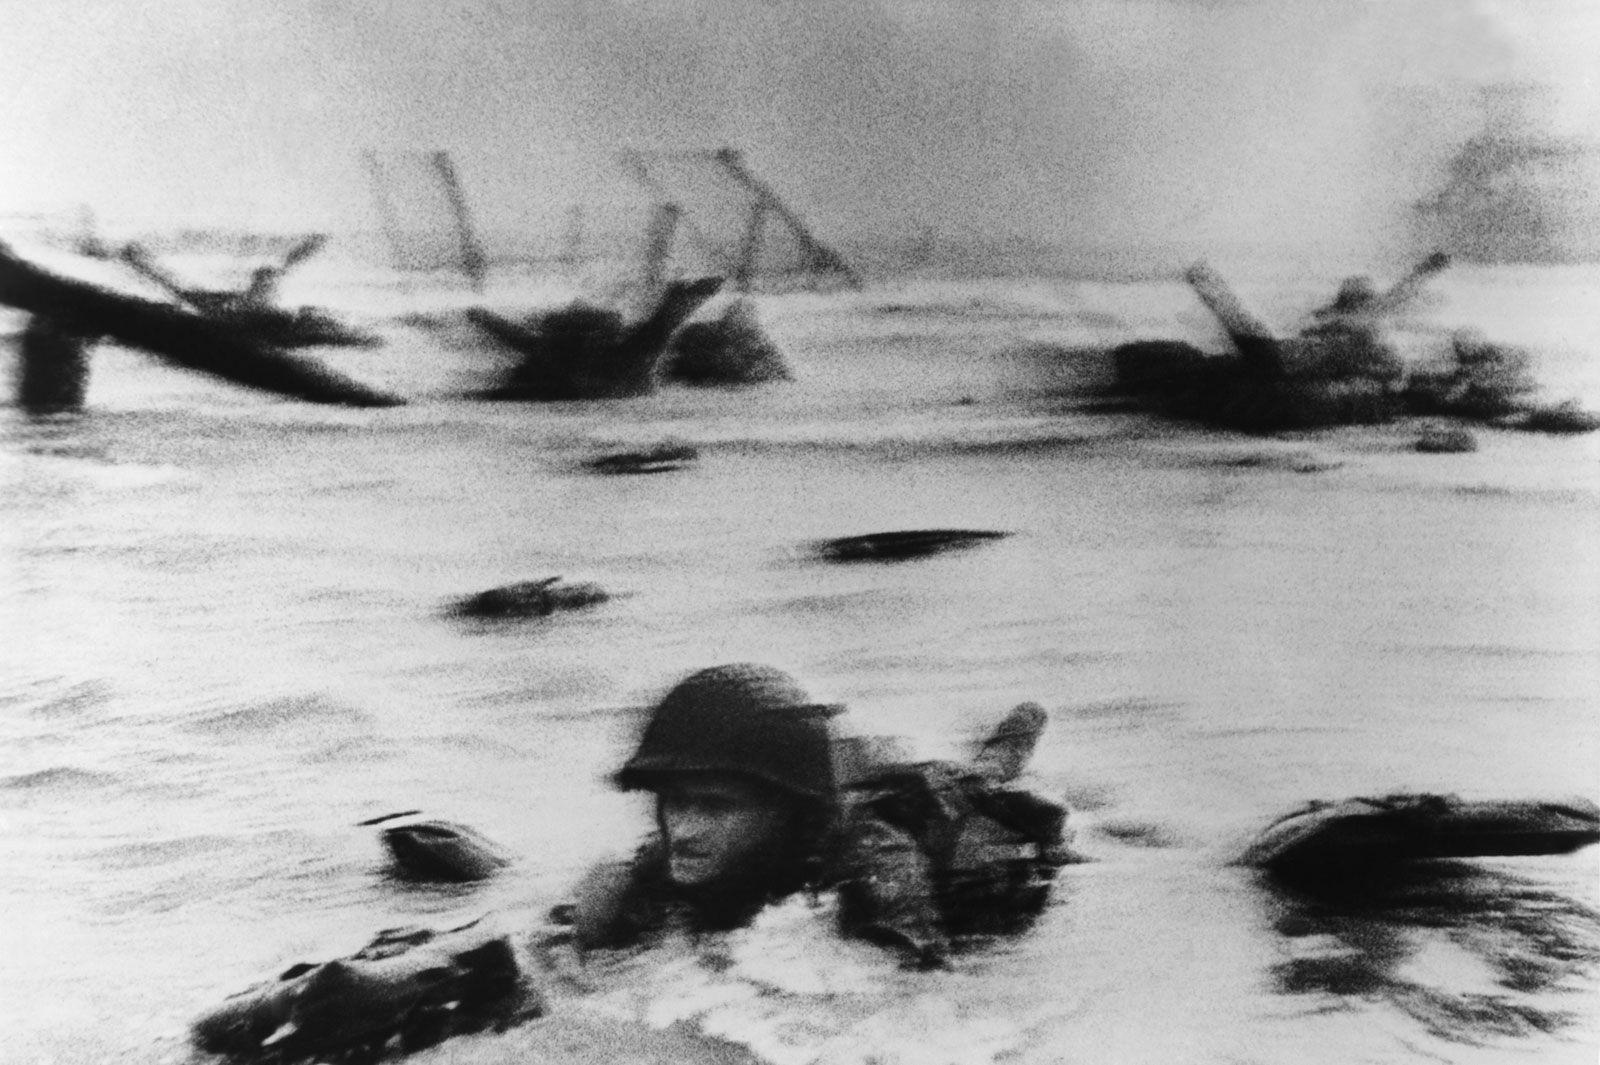 Omaha Beach, Normandy, France - Robert Capa